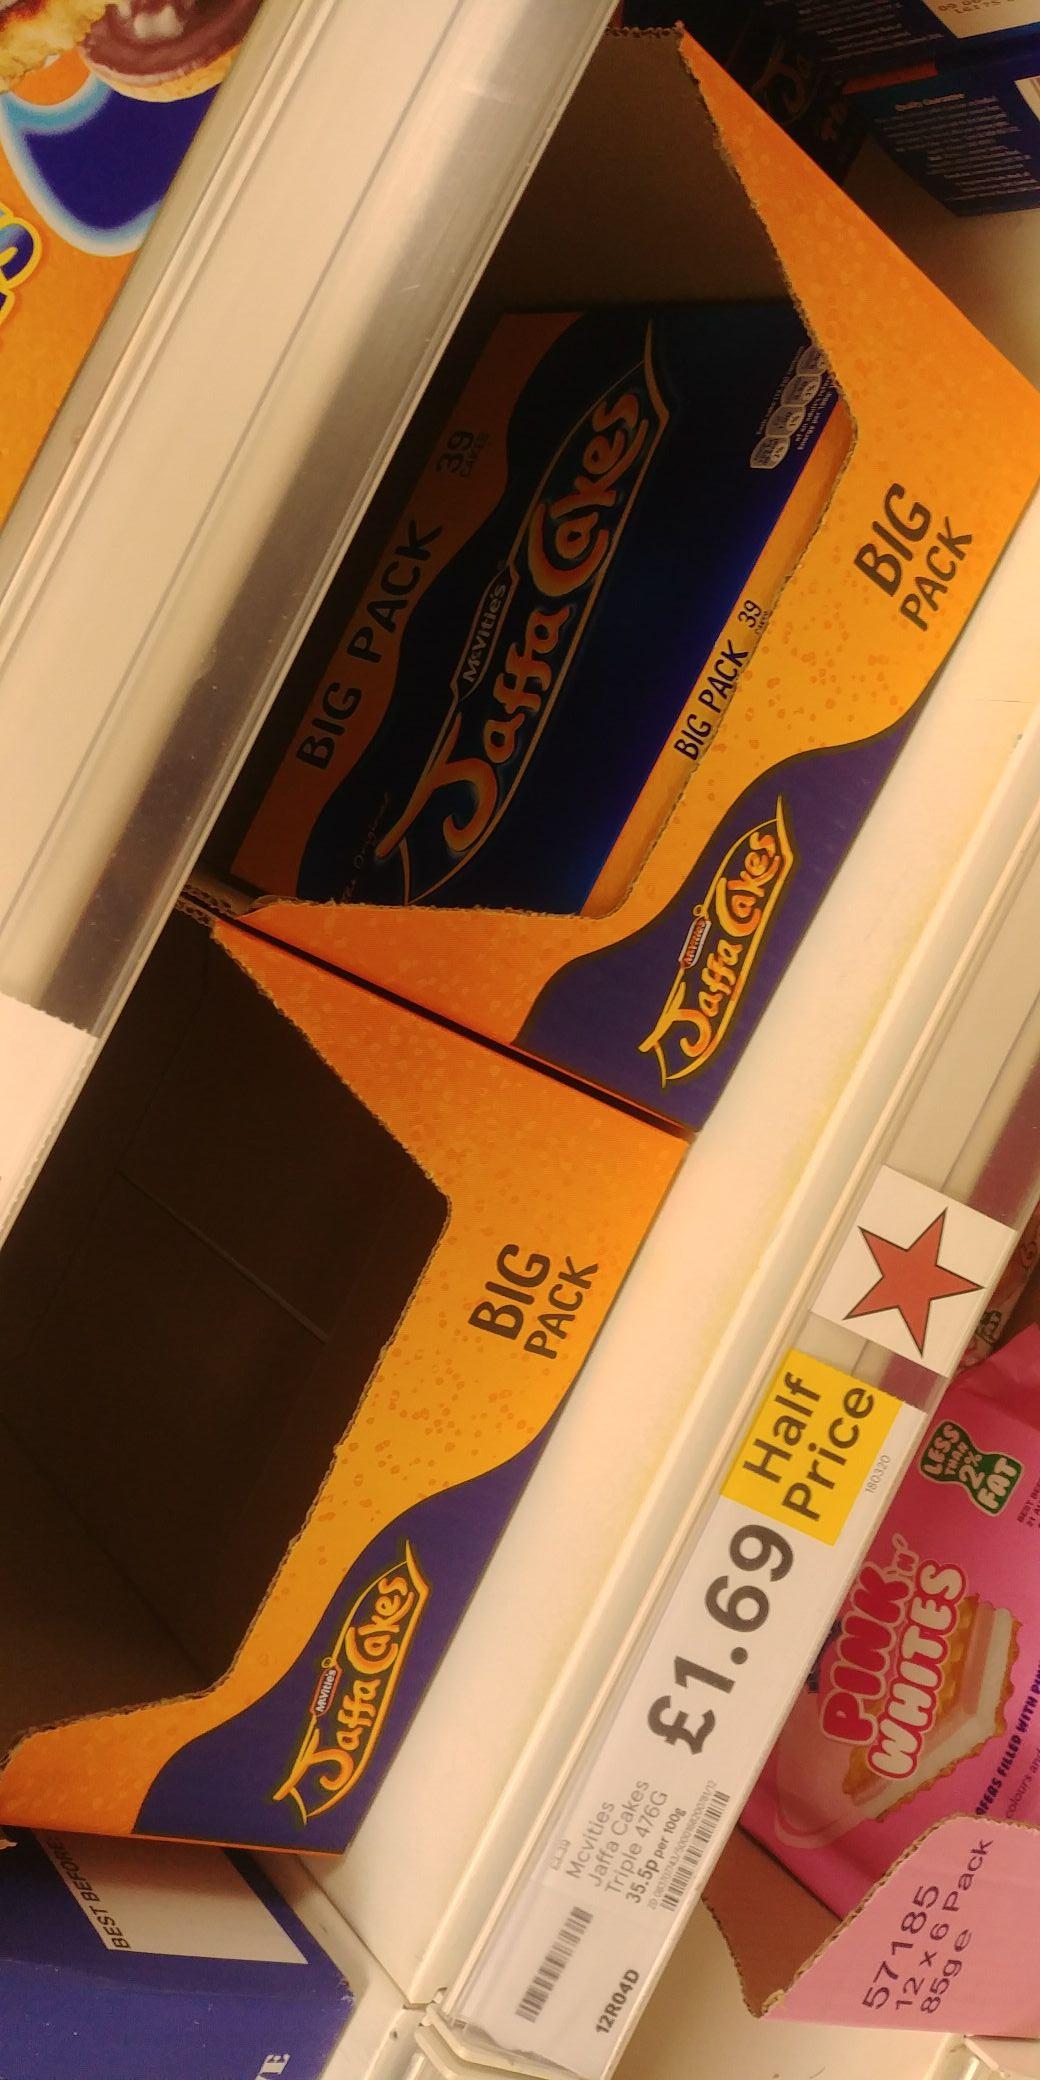 39 Jaffa Cakes Big Pack - Half Price - Tesco - £1.69 (Dundee)